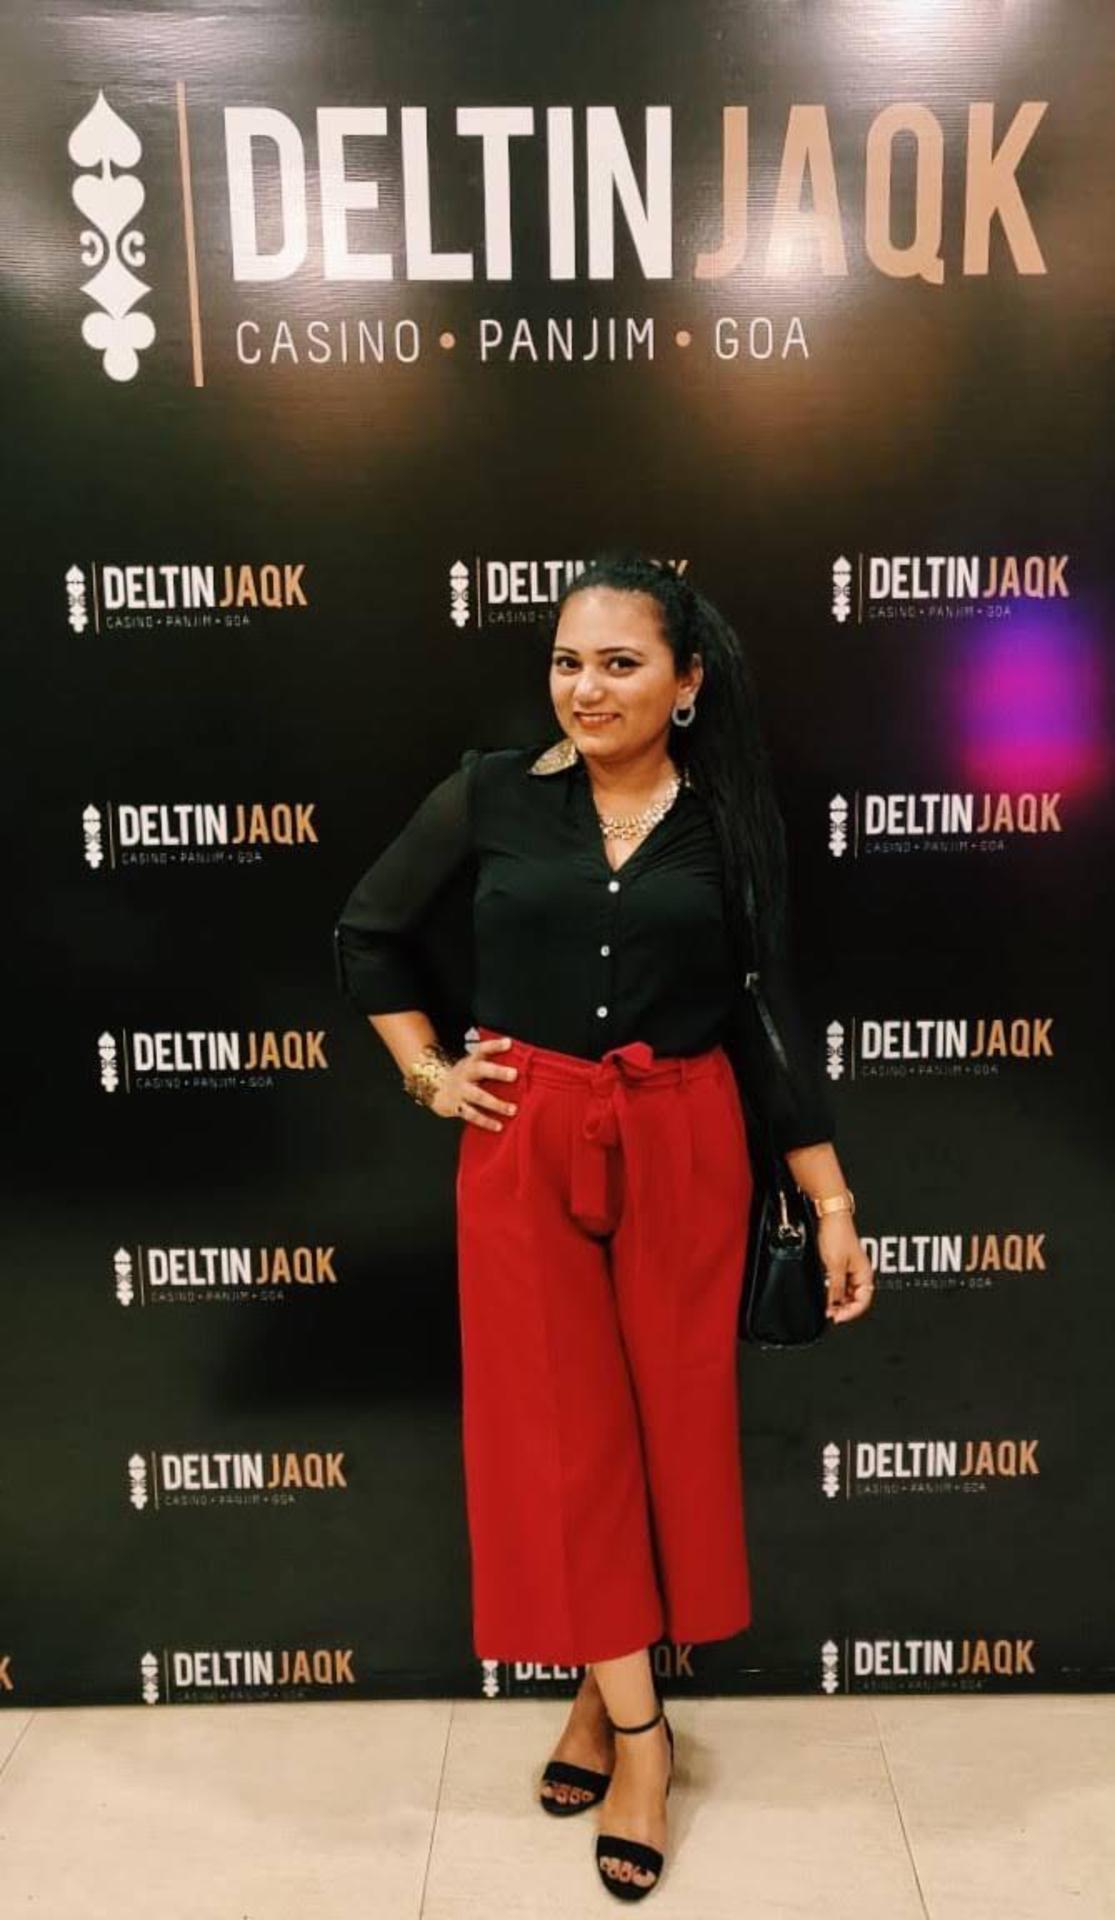 The Jessica Pancholi - 2dabab17-5fd8-4105-bdbf-358df7bd9334